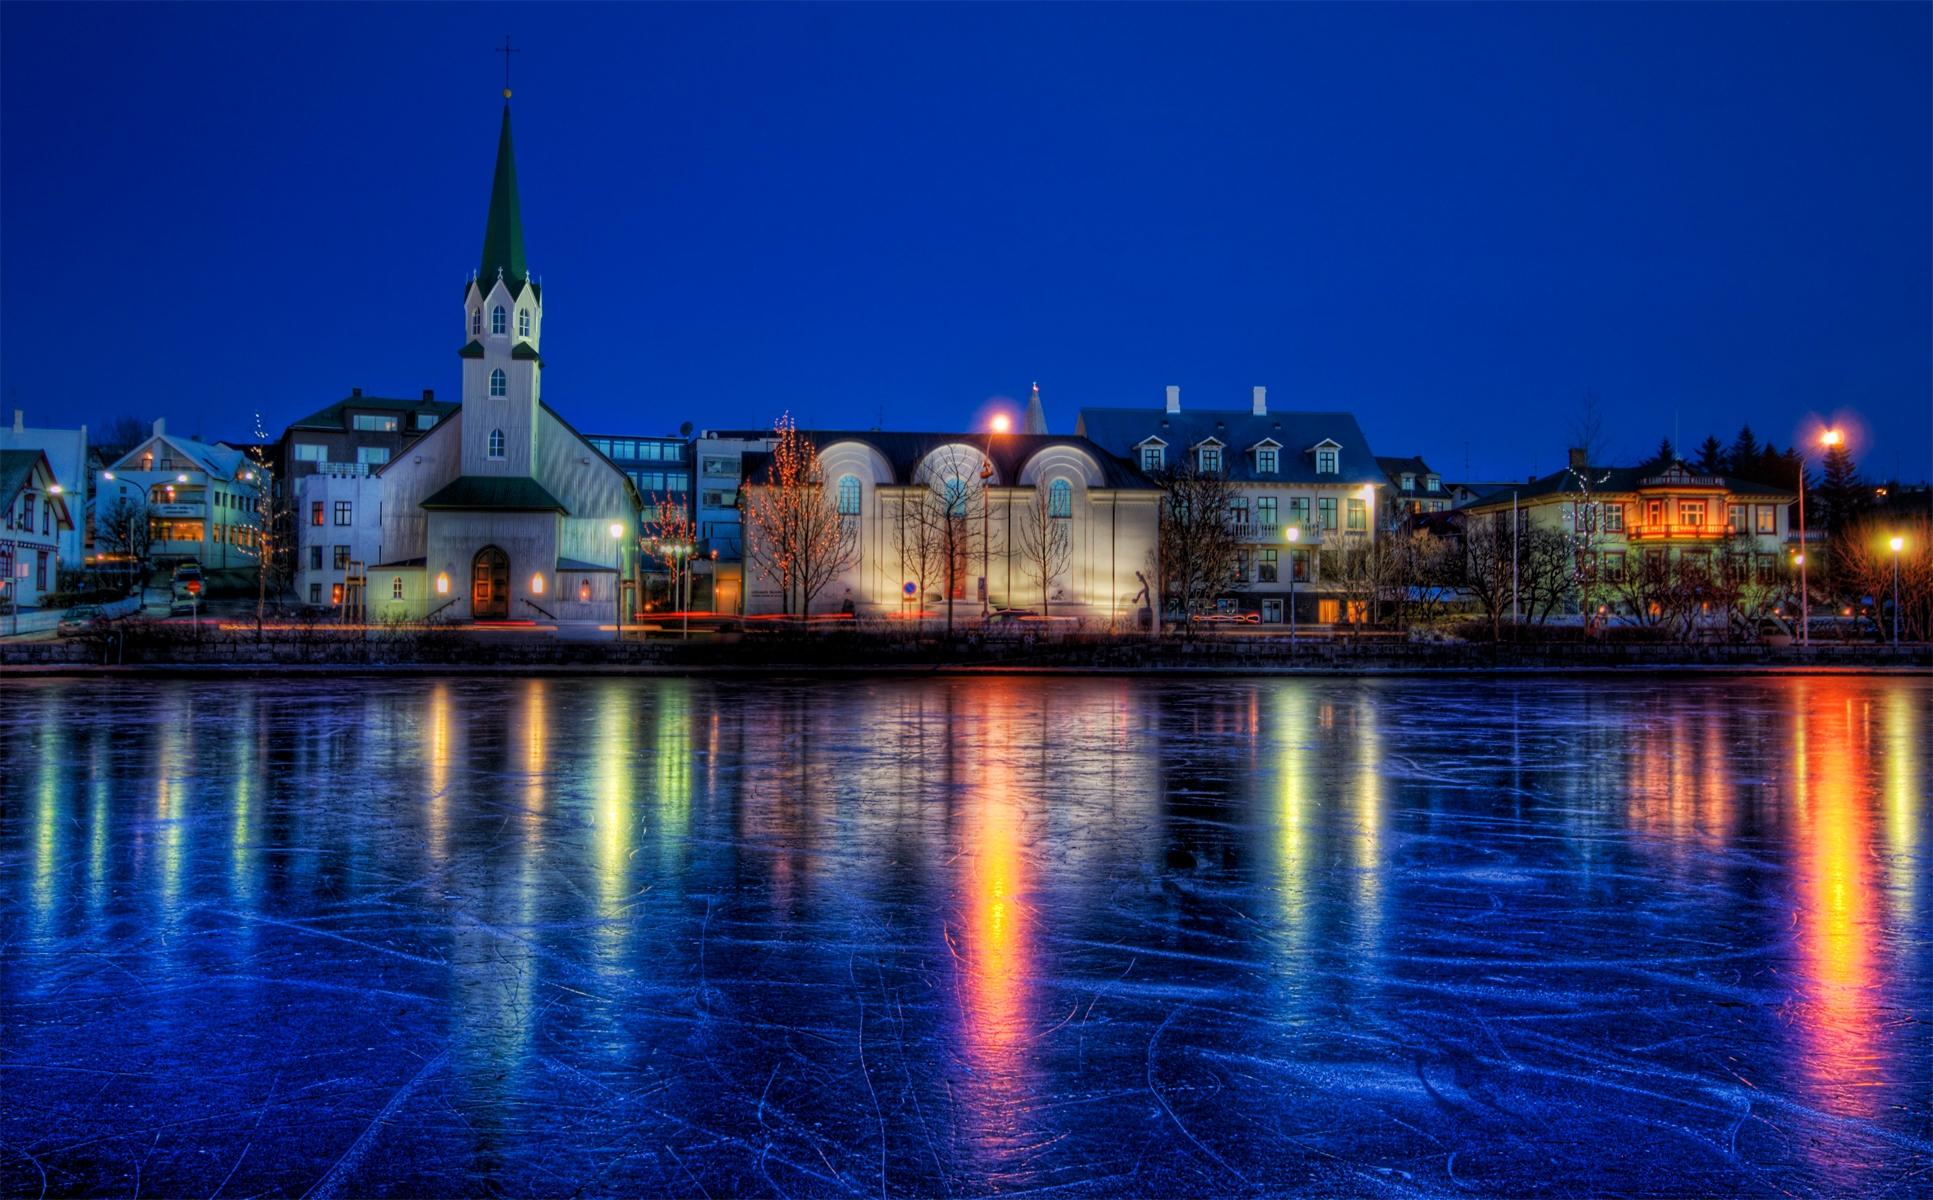 iceland_reykjavik-golubaia-laguna